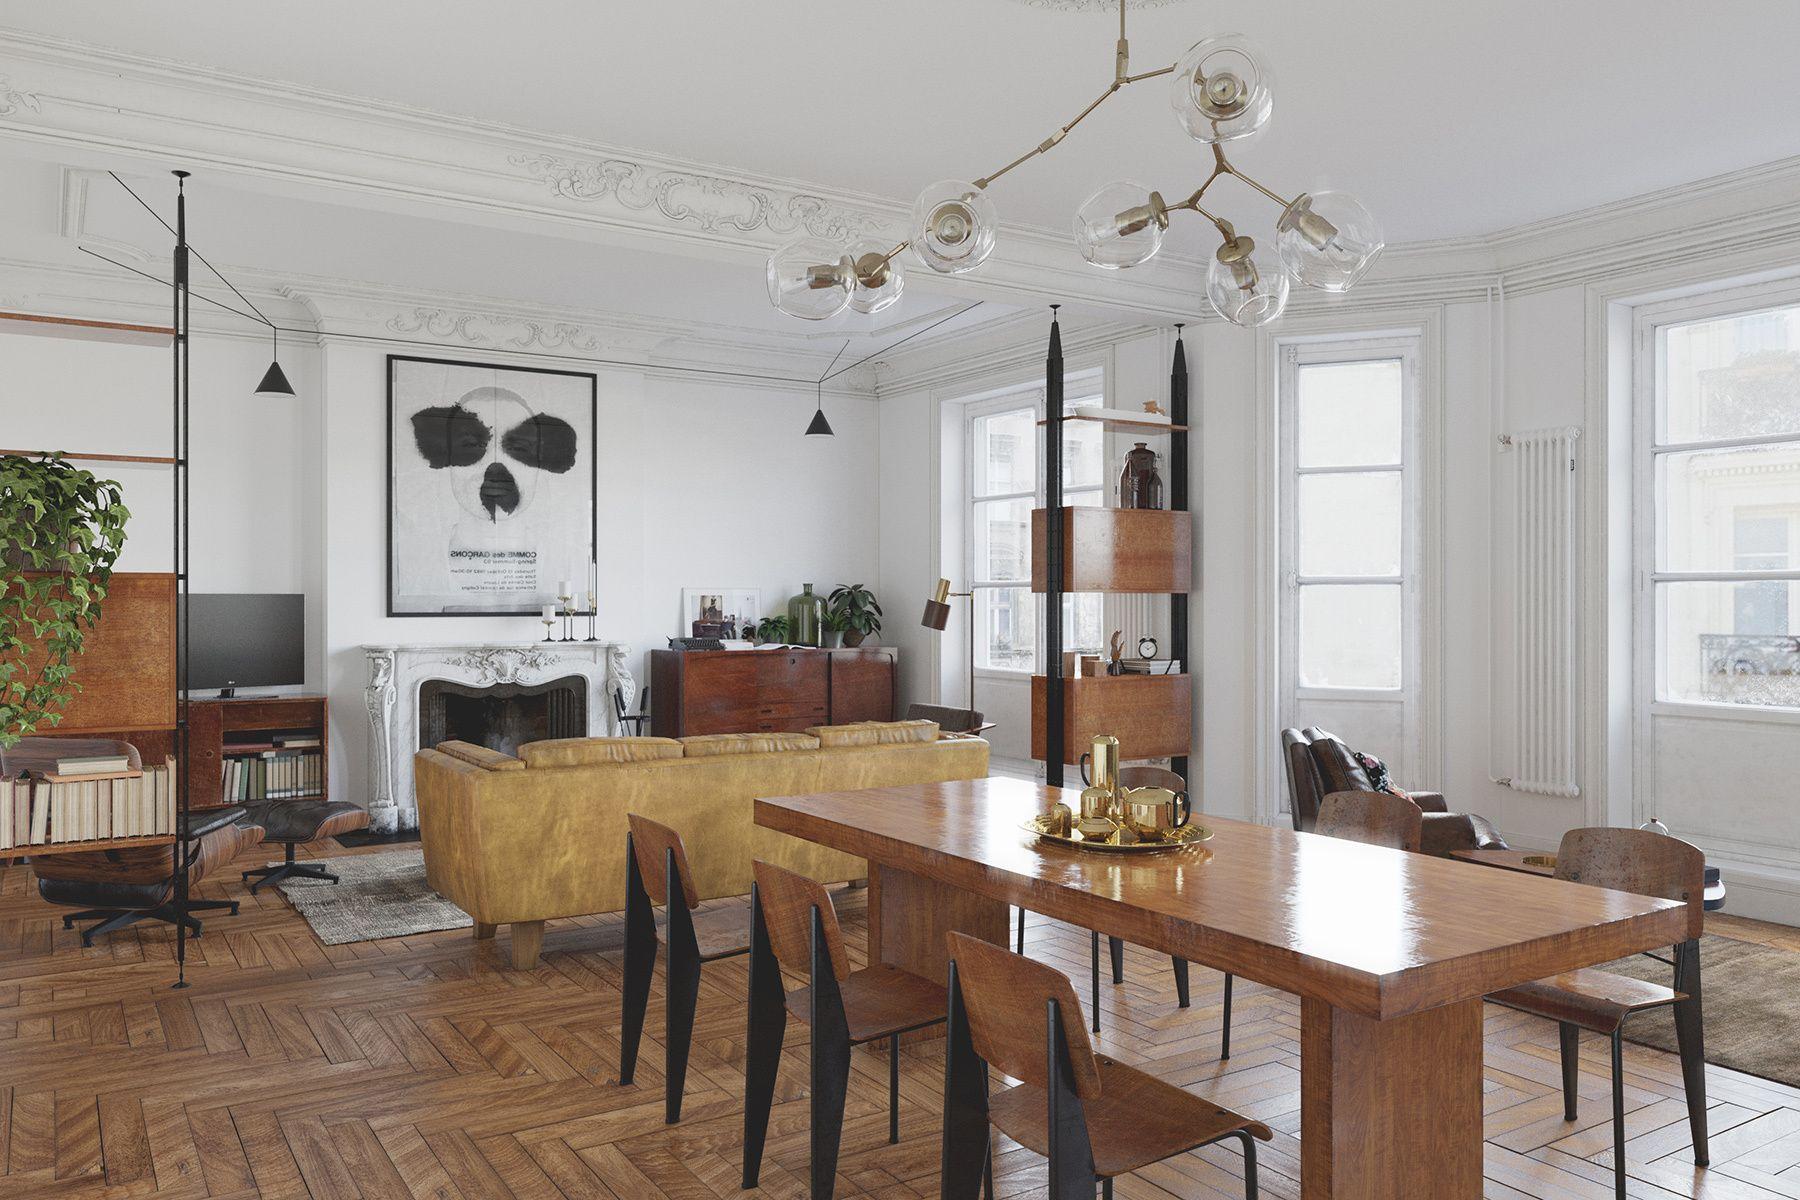 Unltd Casa En Borovliany De Nordes 803996748 1800x1200